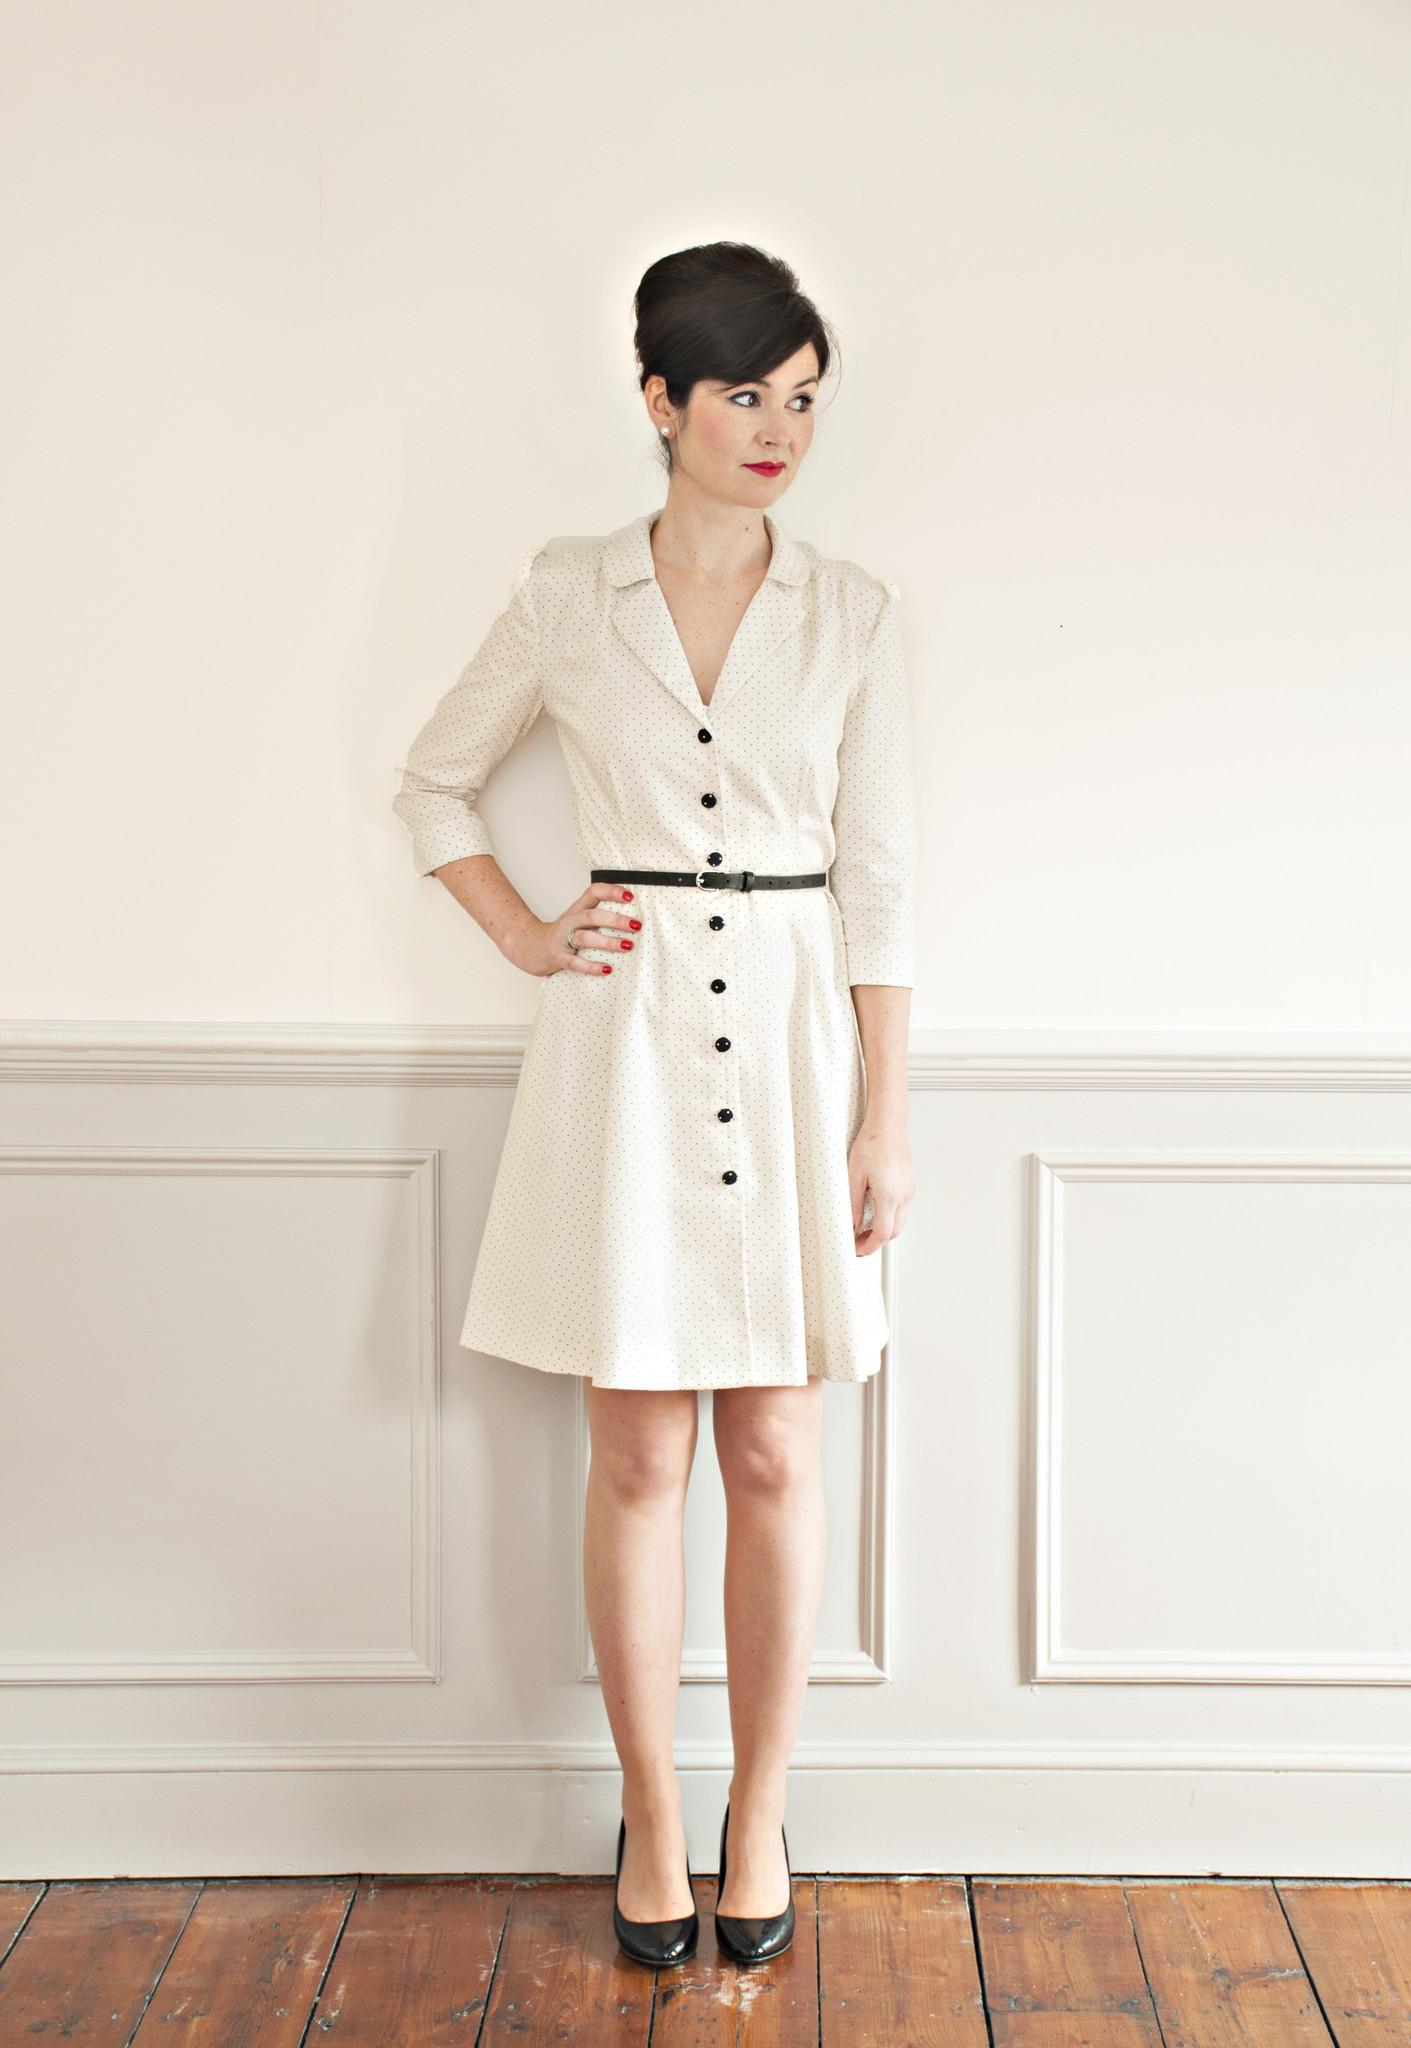 NEW_Vintage_dress1_-_530.jpg